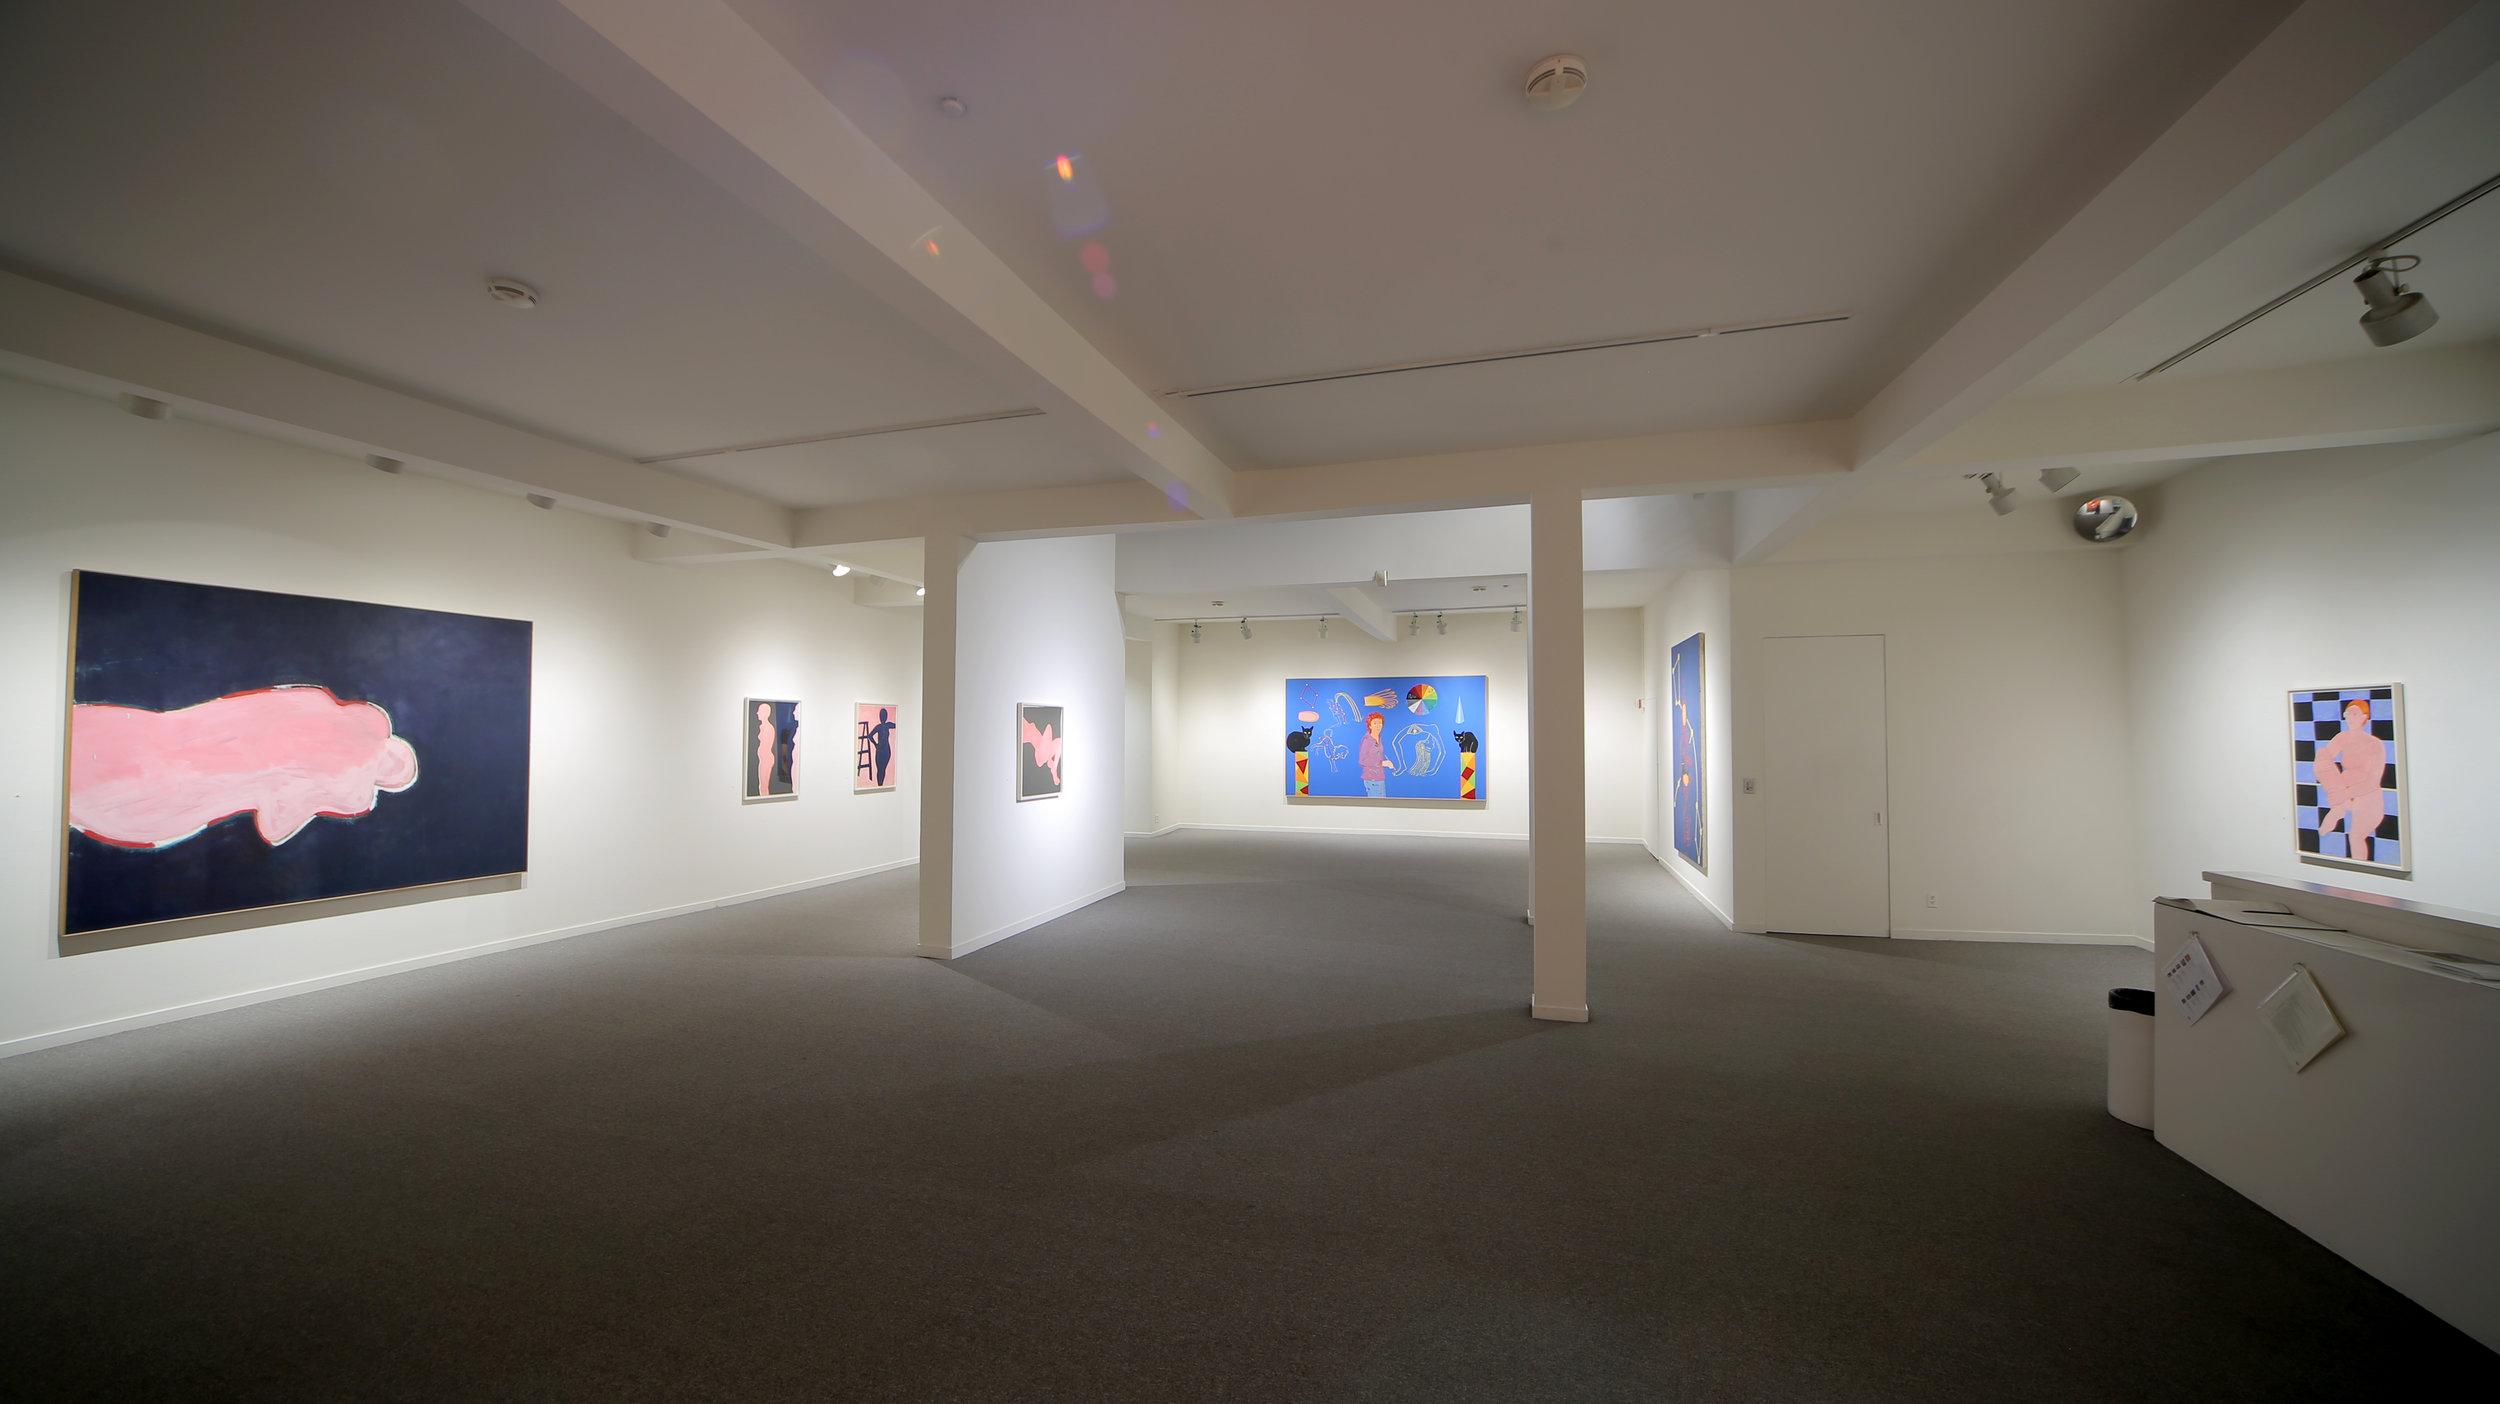 Anglim Gilbert Gallery, Joan Brown, October 8 - November 15, 2014 3.jpg